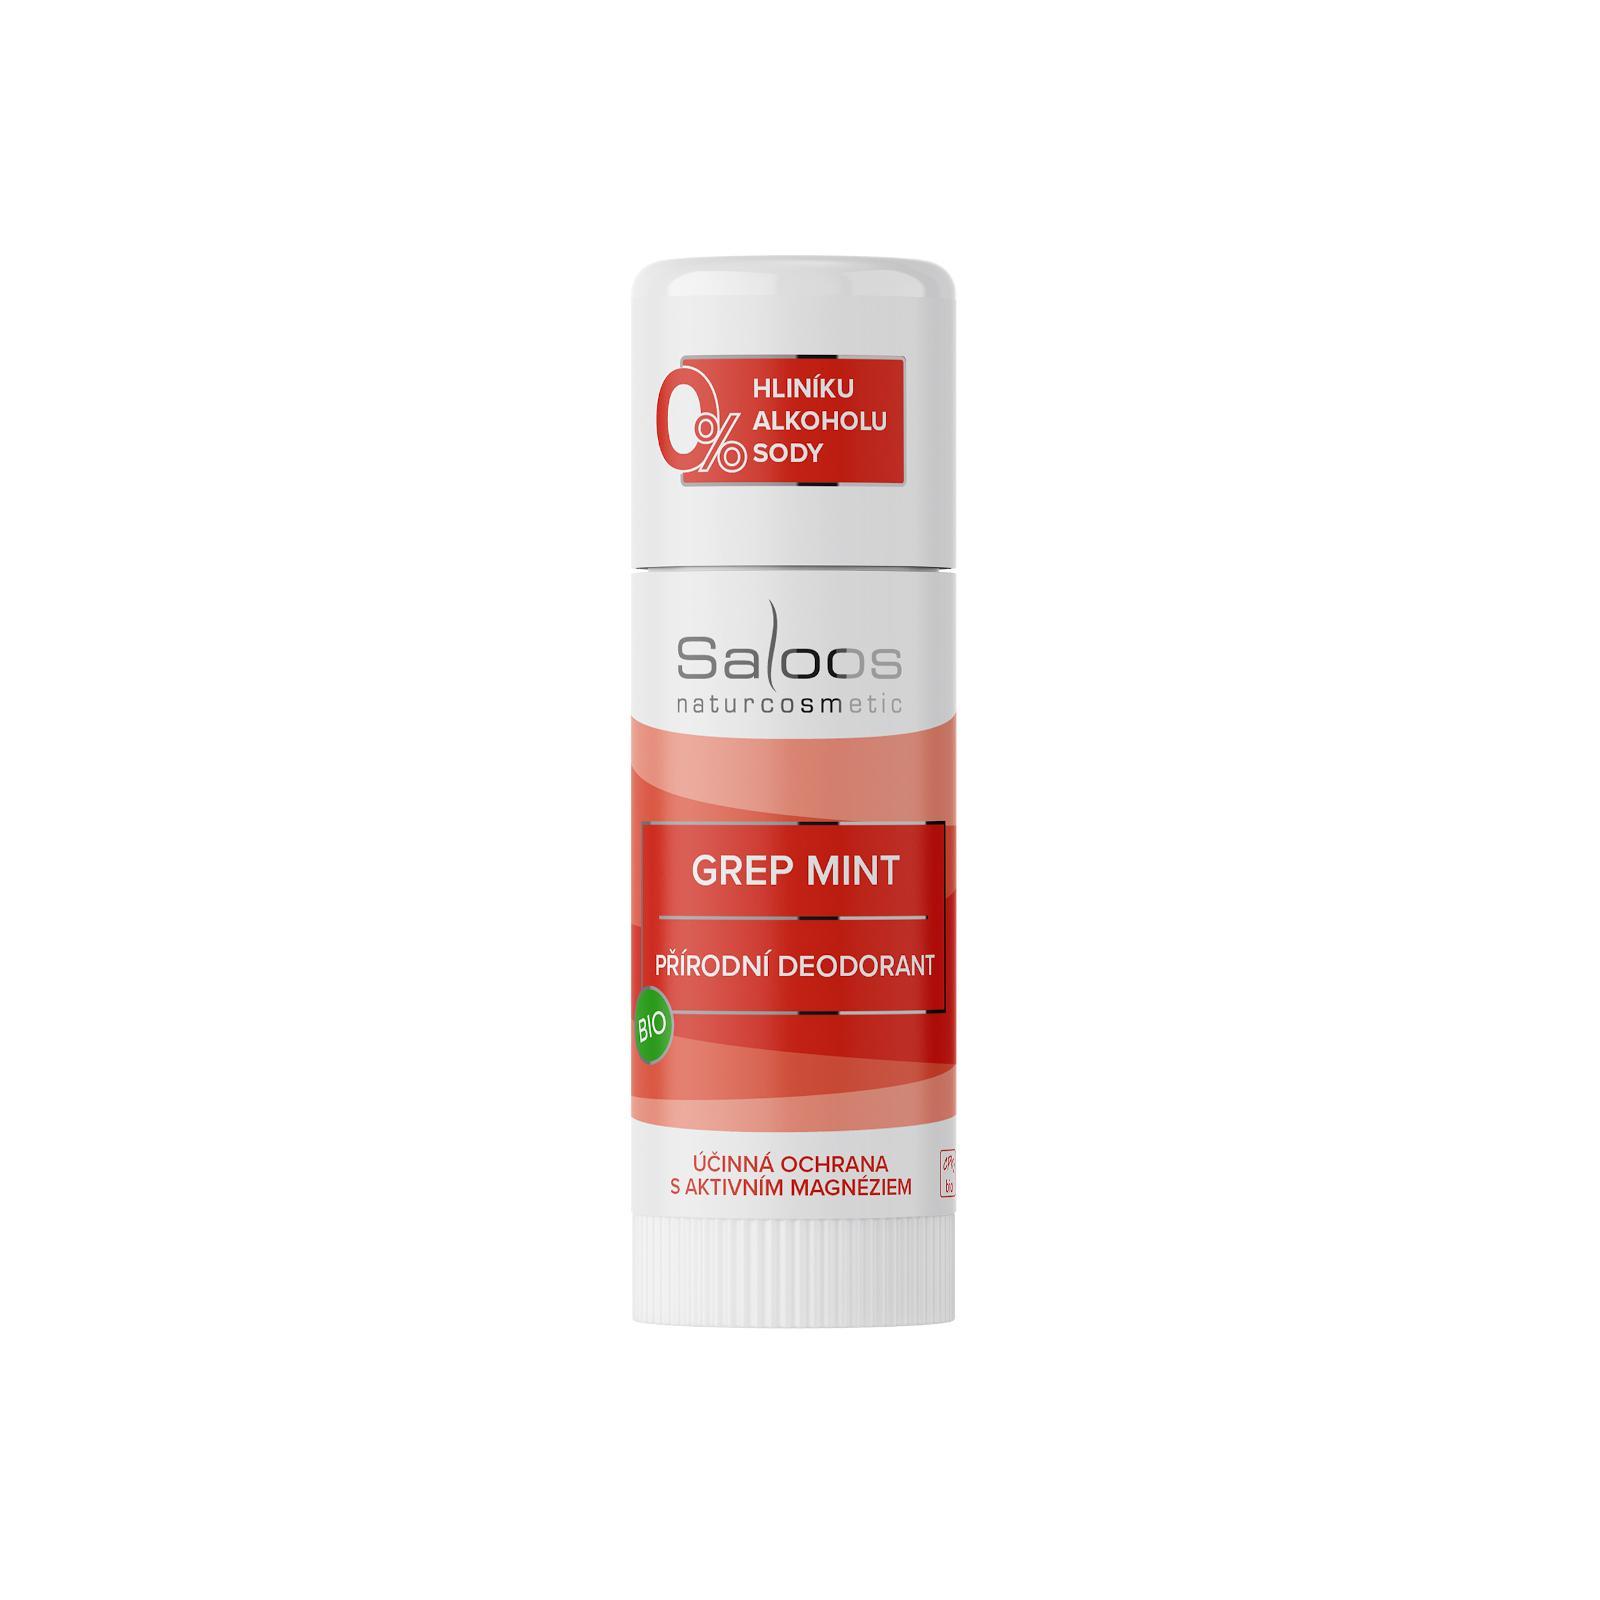 Saloos bio přírodní deodorant Grep Mint